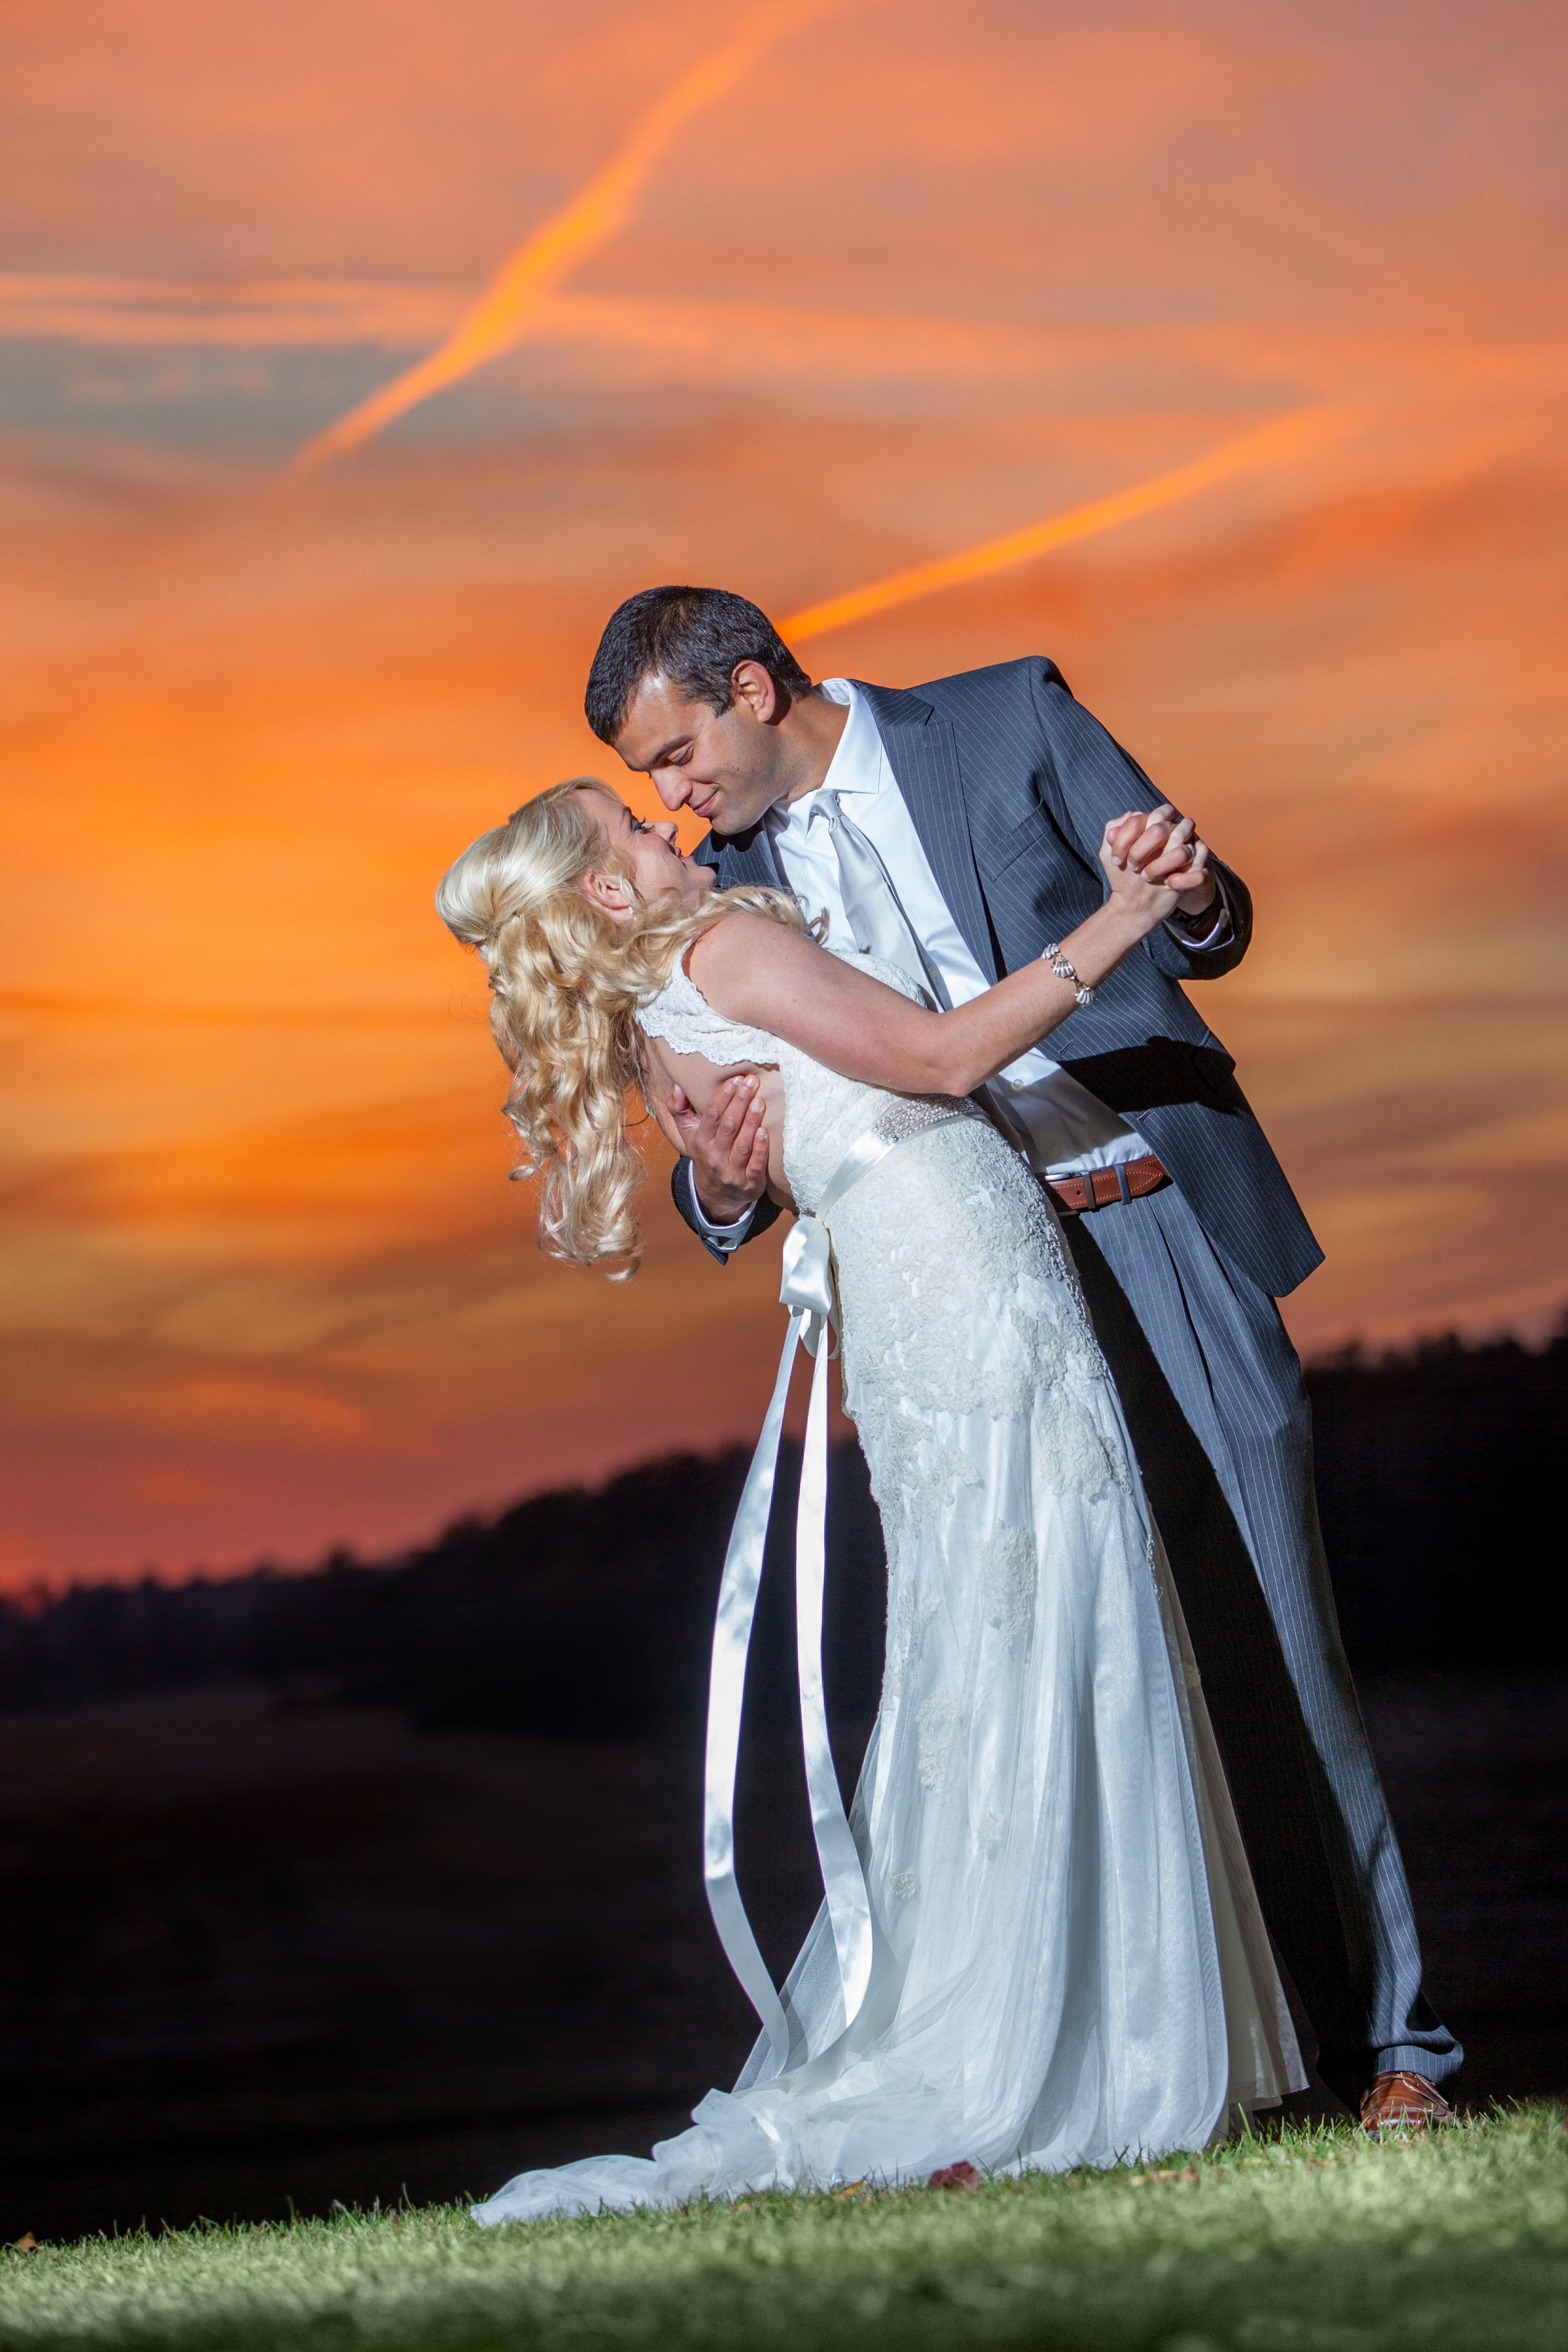 Wedding_Pose_Brad Cottrell_IMG_2714_2.jpg